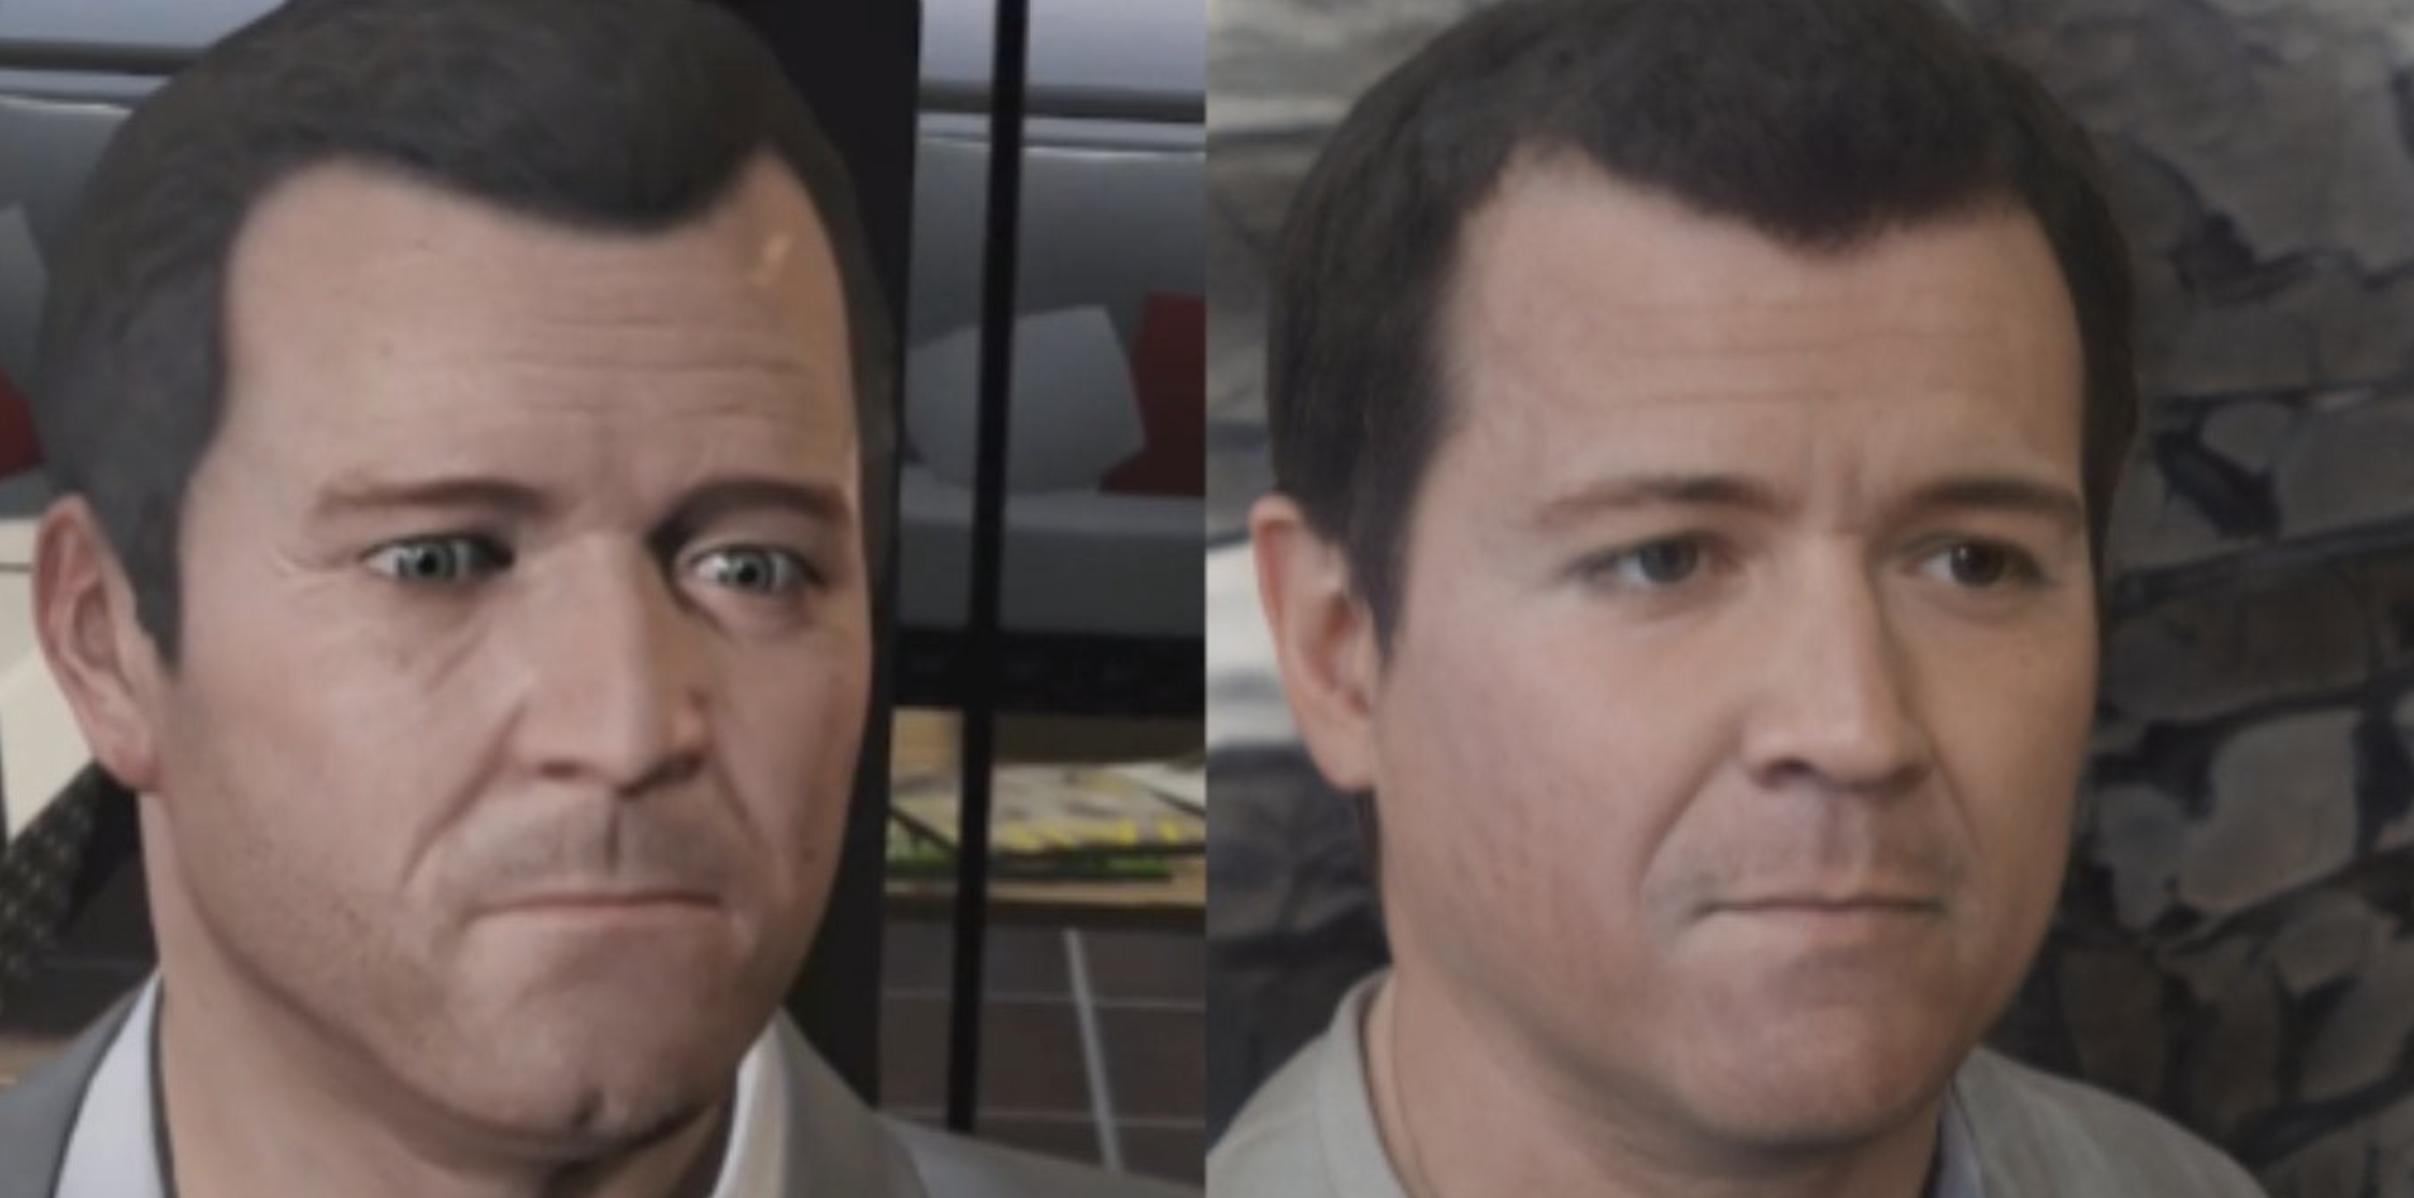 realistic video game characters - Michael (GTA V)